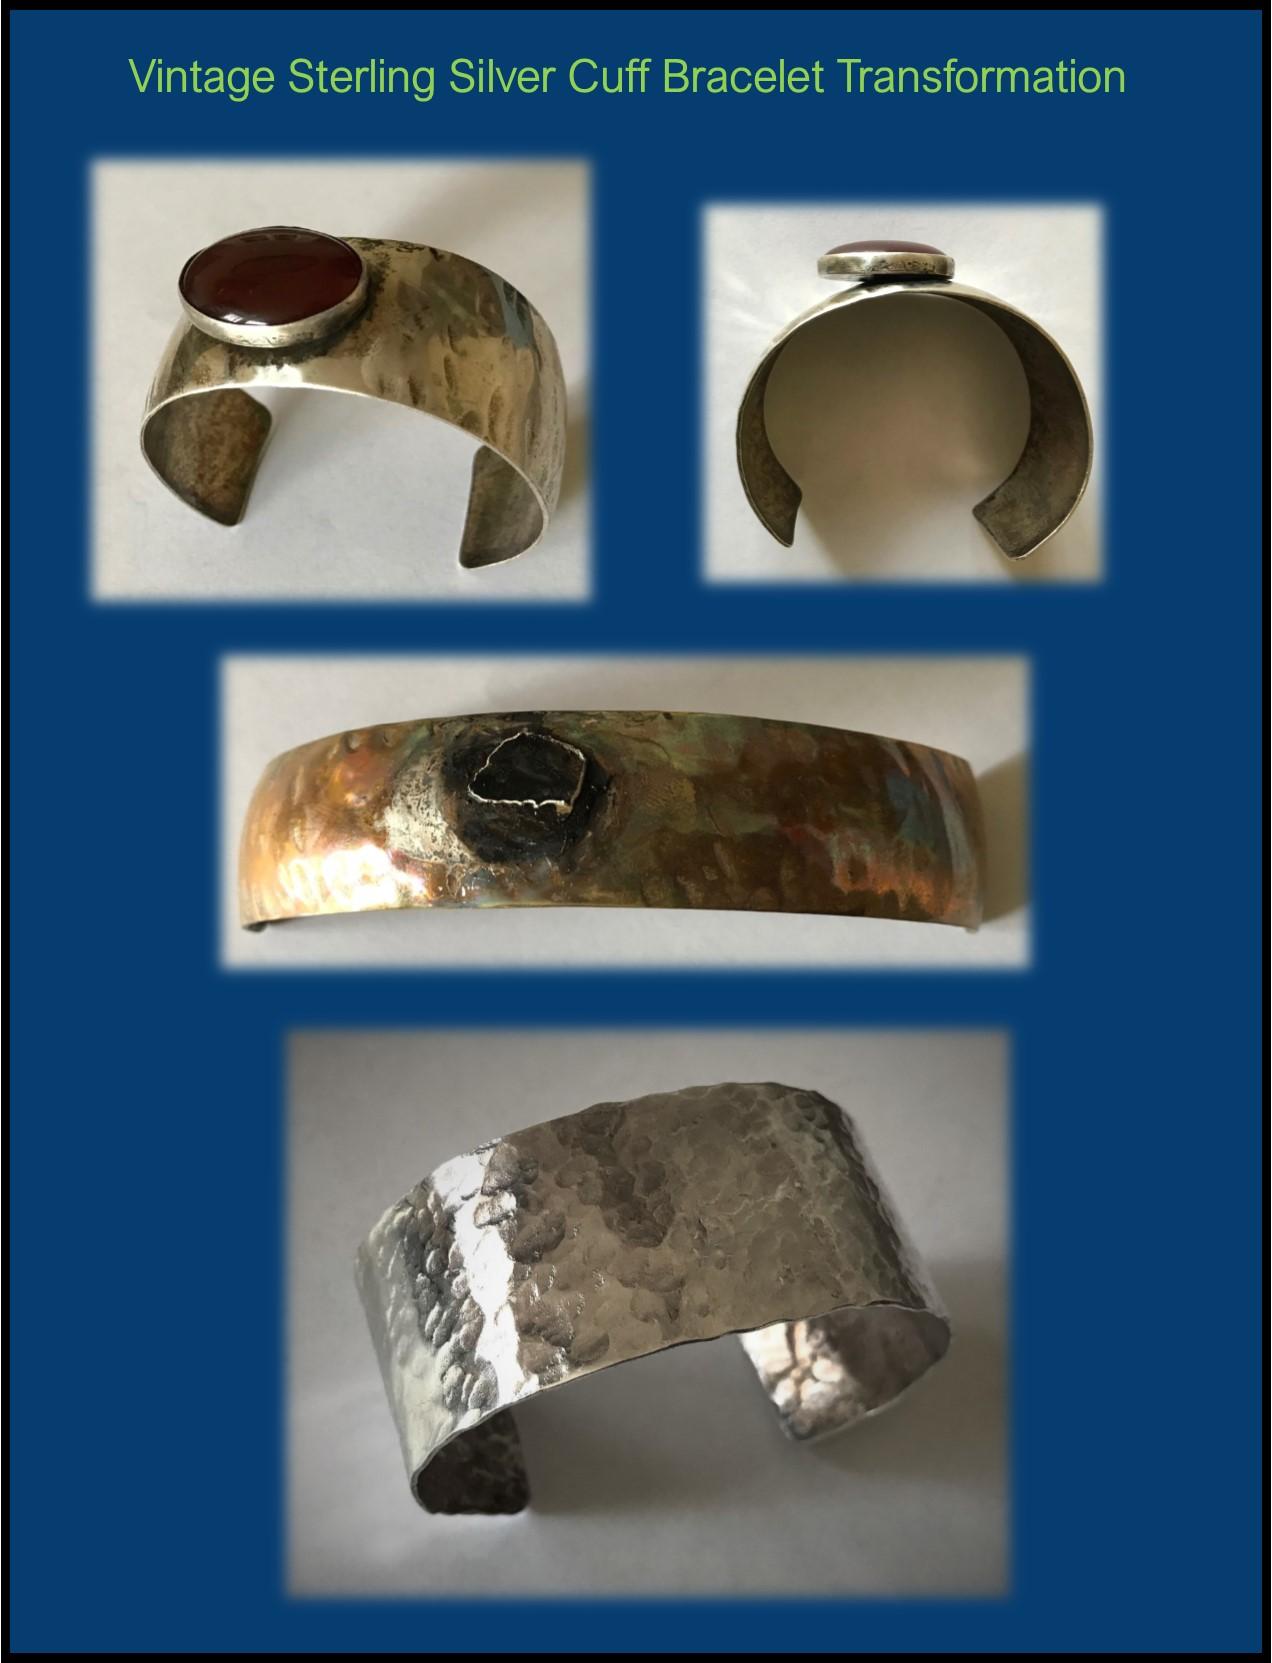 Sterling cuff